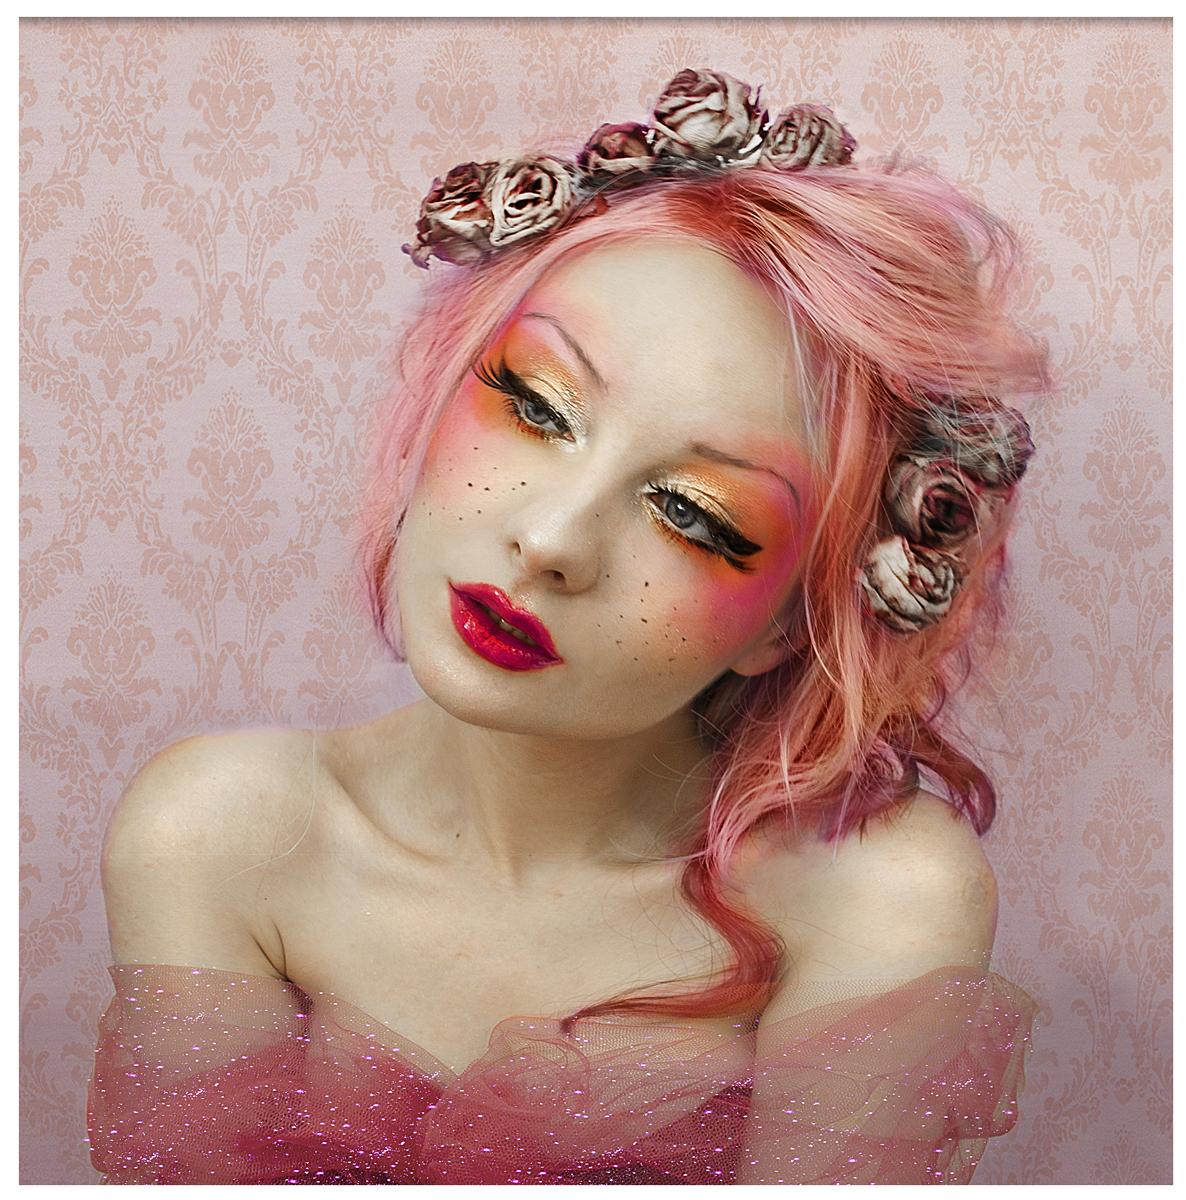 The_Wild_Rose_Mesmerizing_Stories_beautifulbizarre (6)